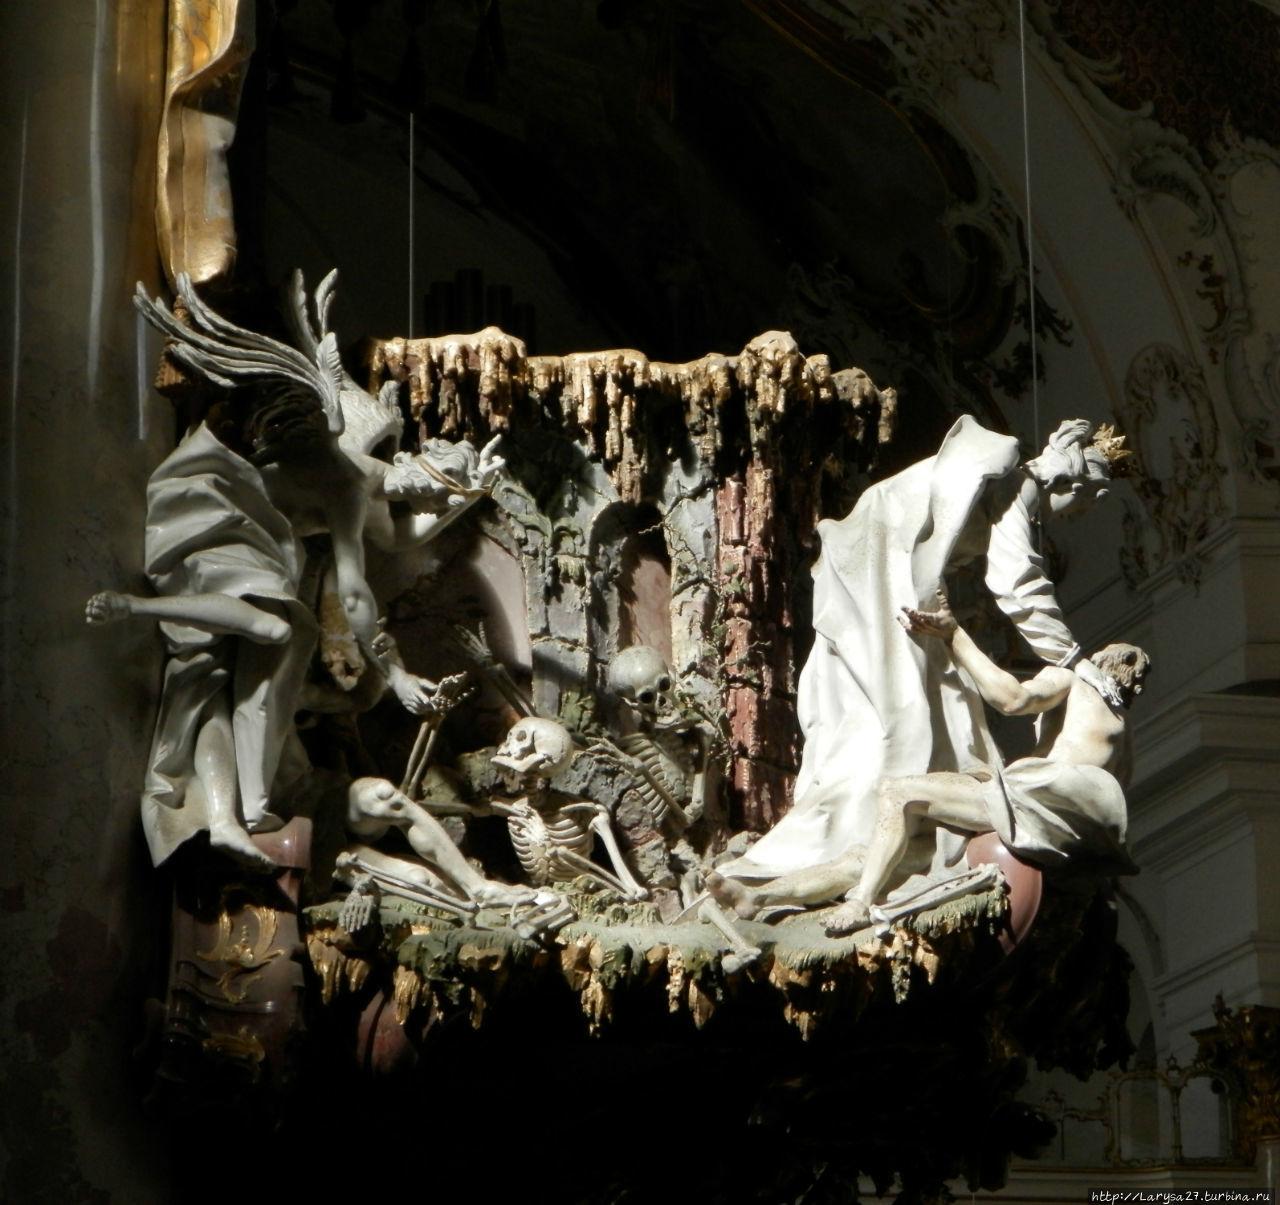 Деталь кафедры, скульптур